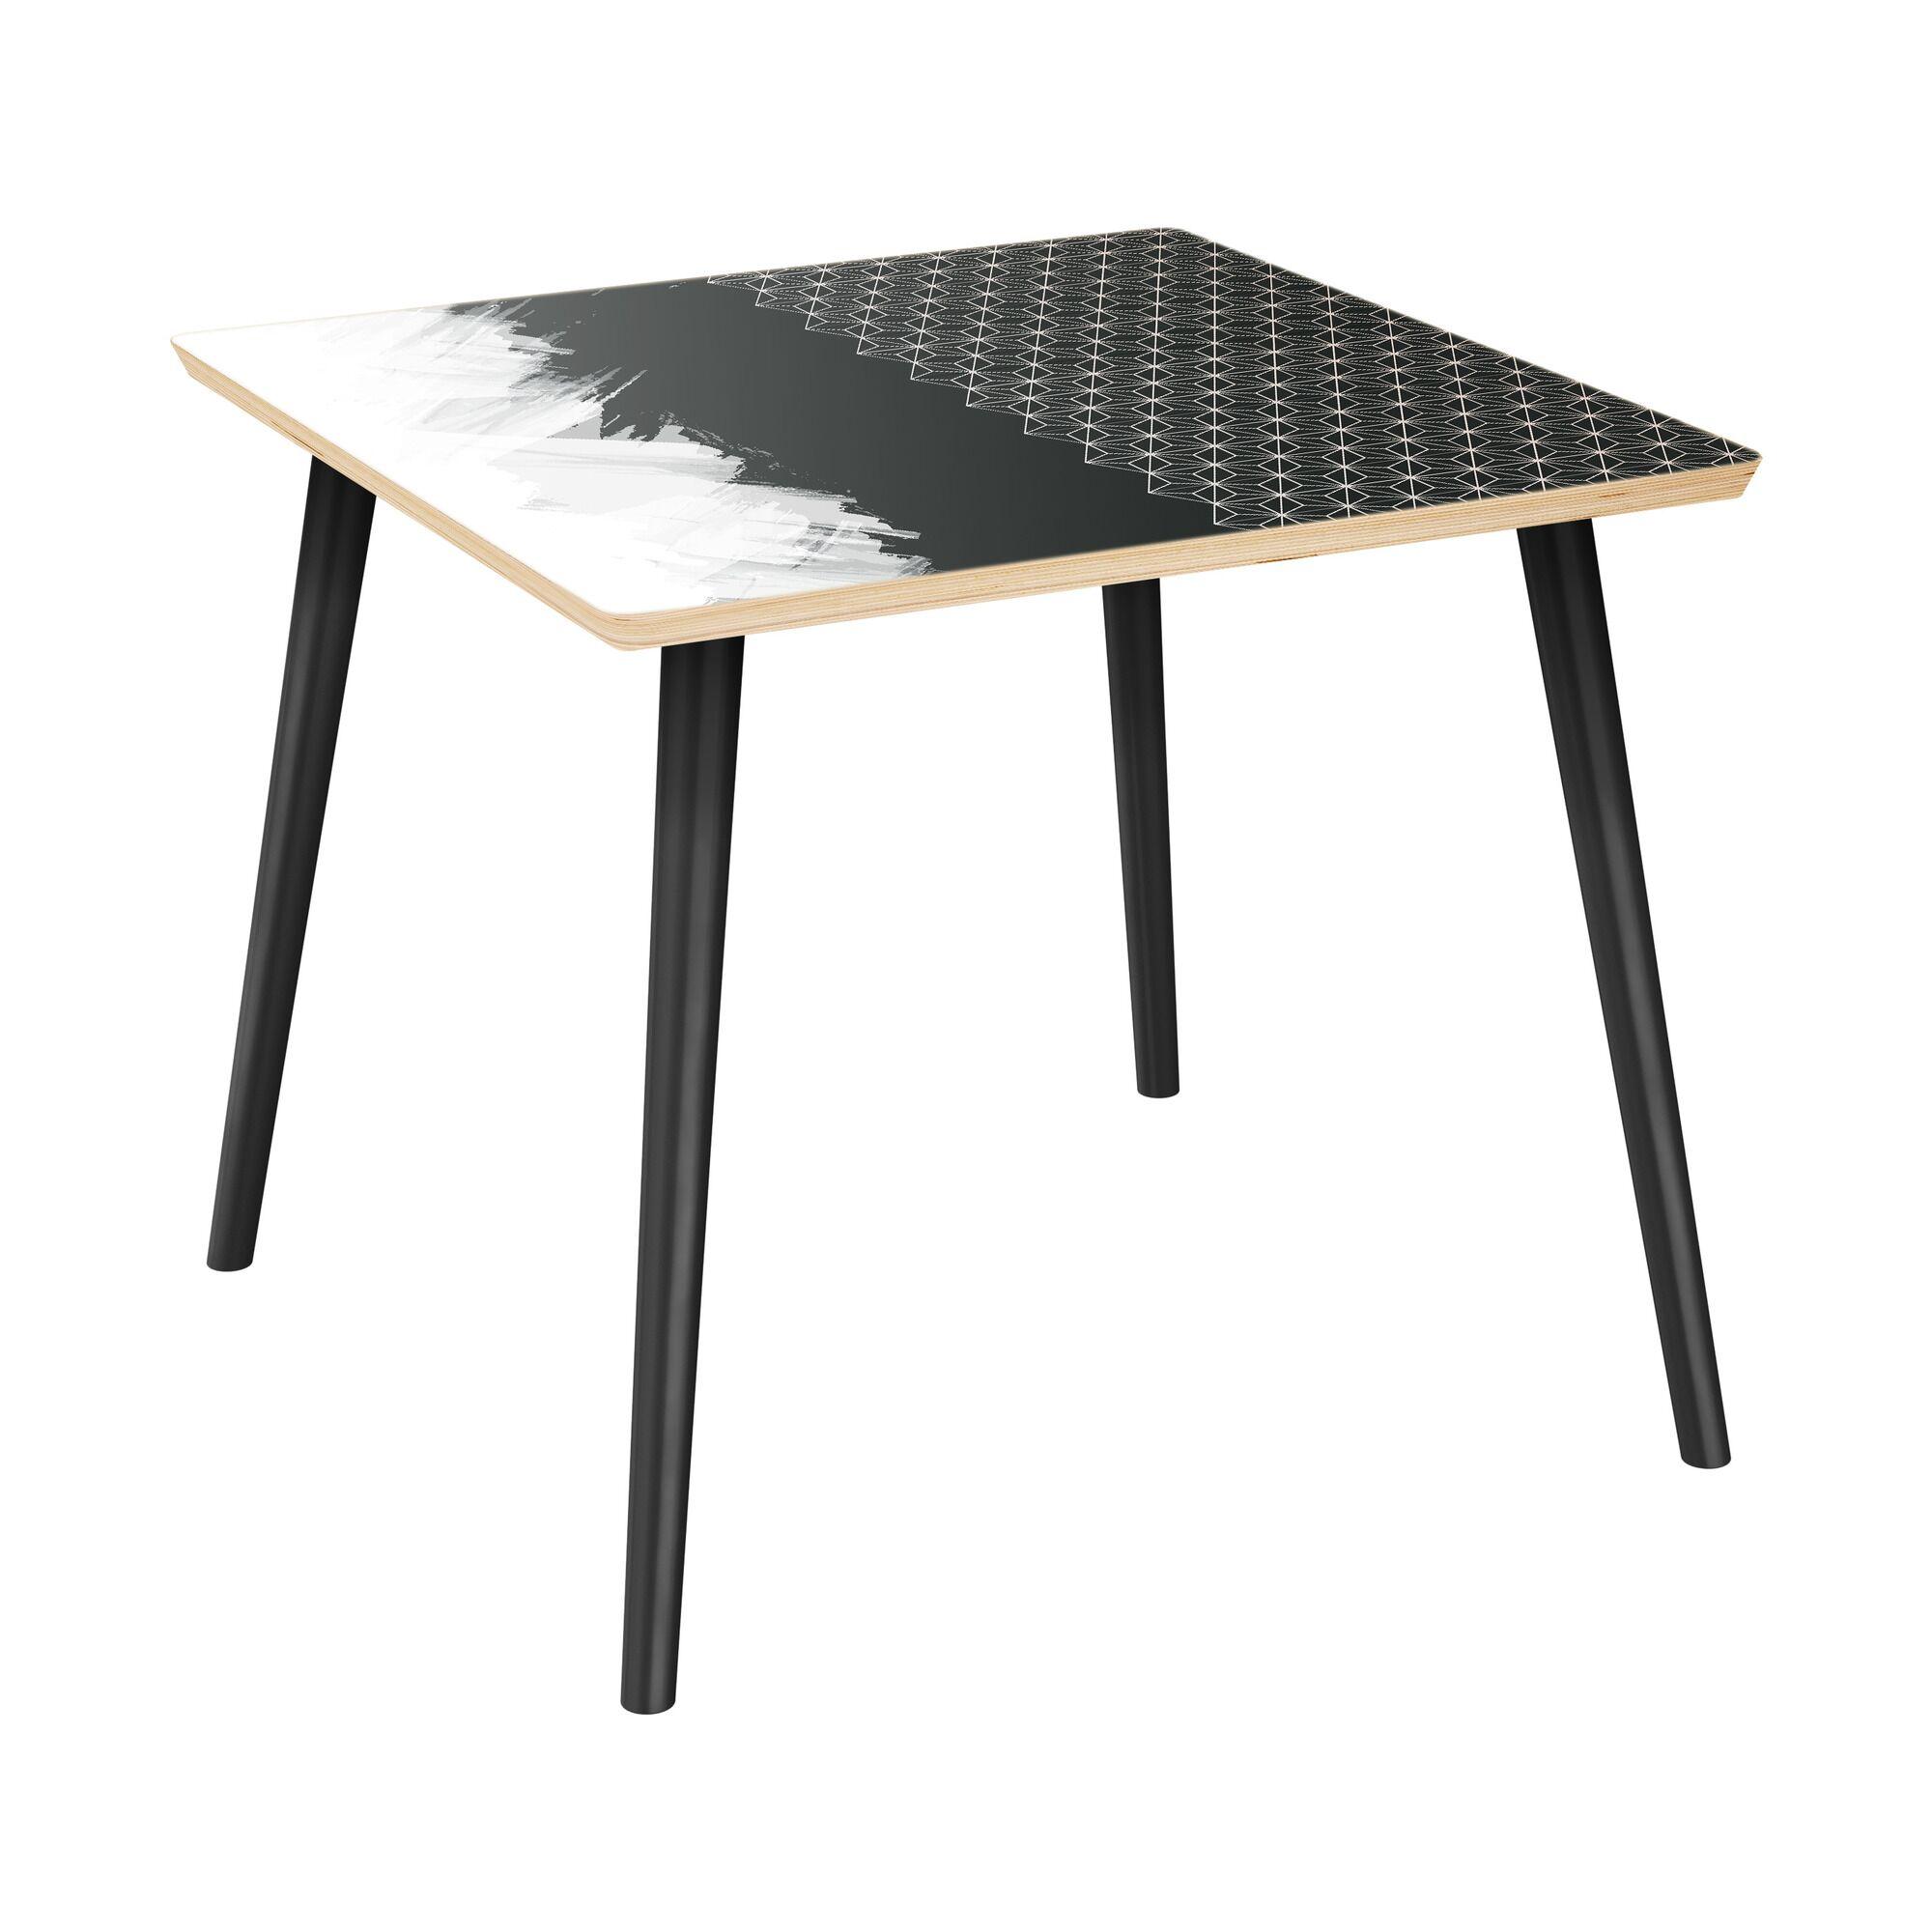 Ewalt End Table Table Top Color: Natural, Table Base Color: Black